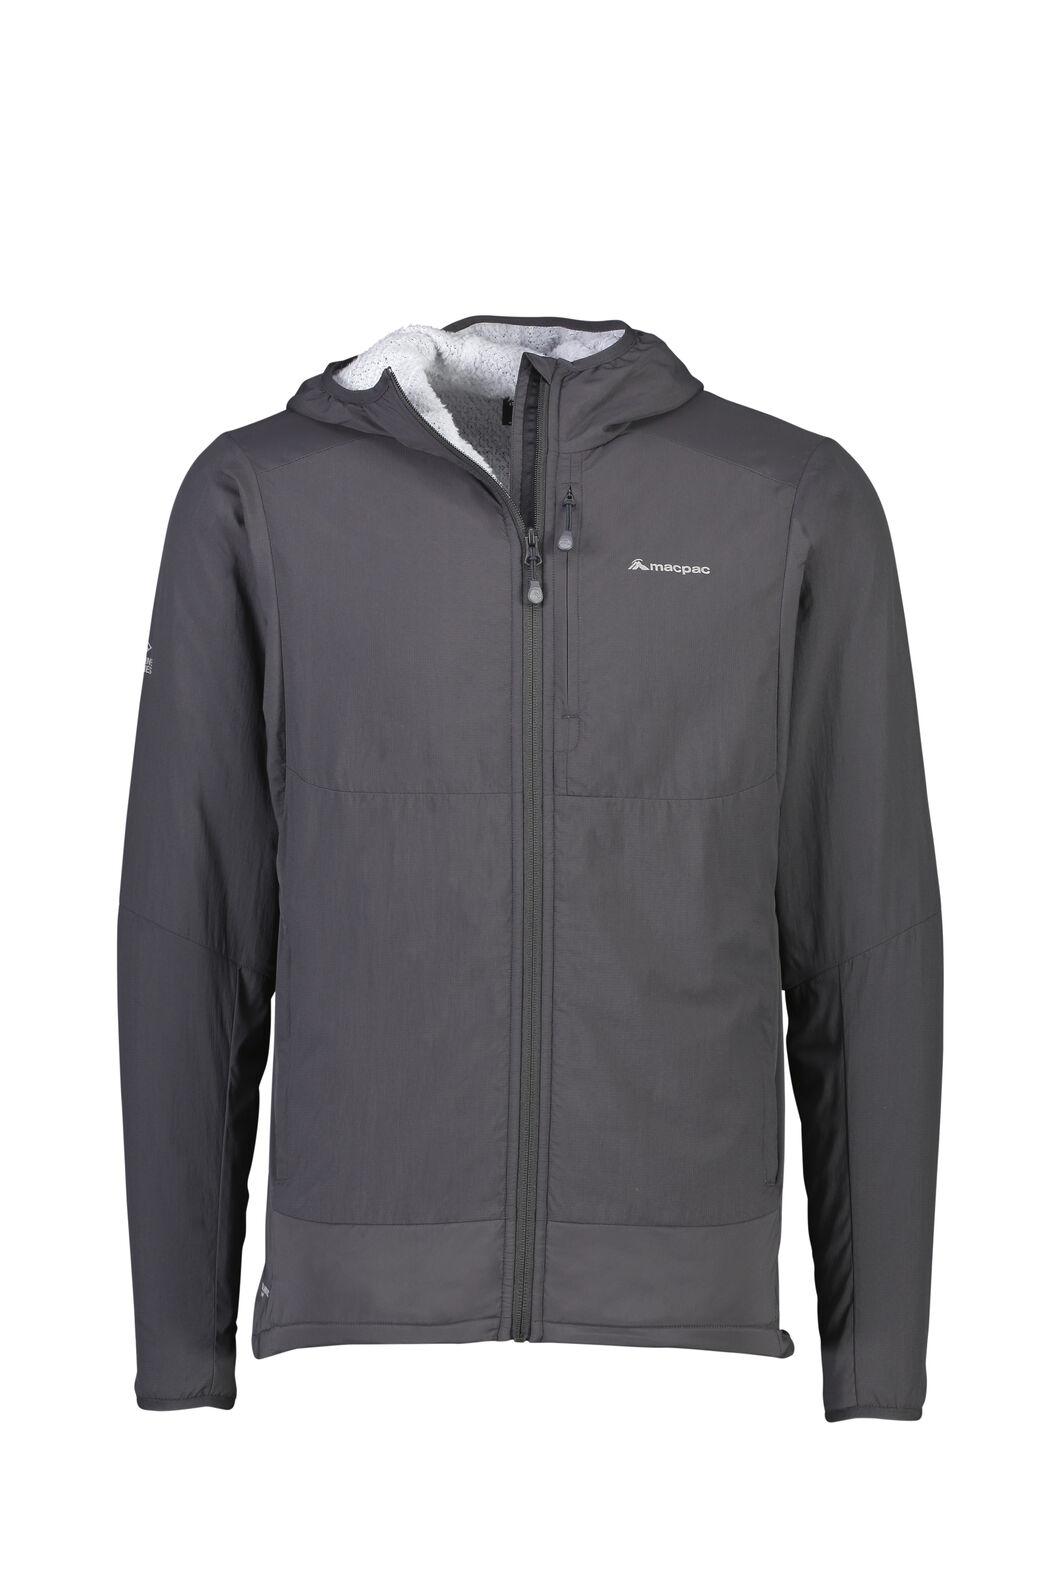 Macpac Pisa Polartec® Hooded Jacket — Men's, Phantom/Pearl, hi-res